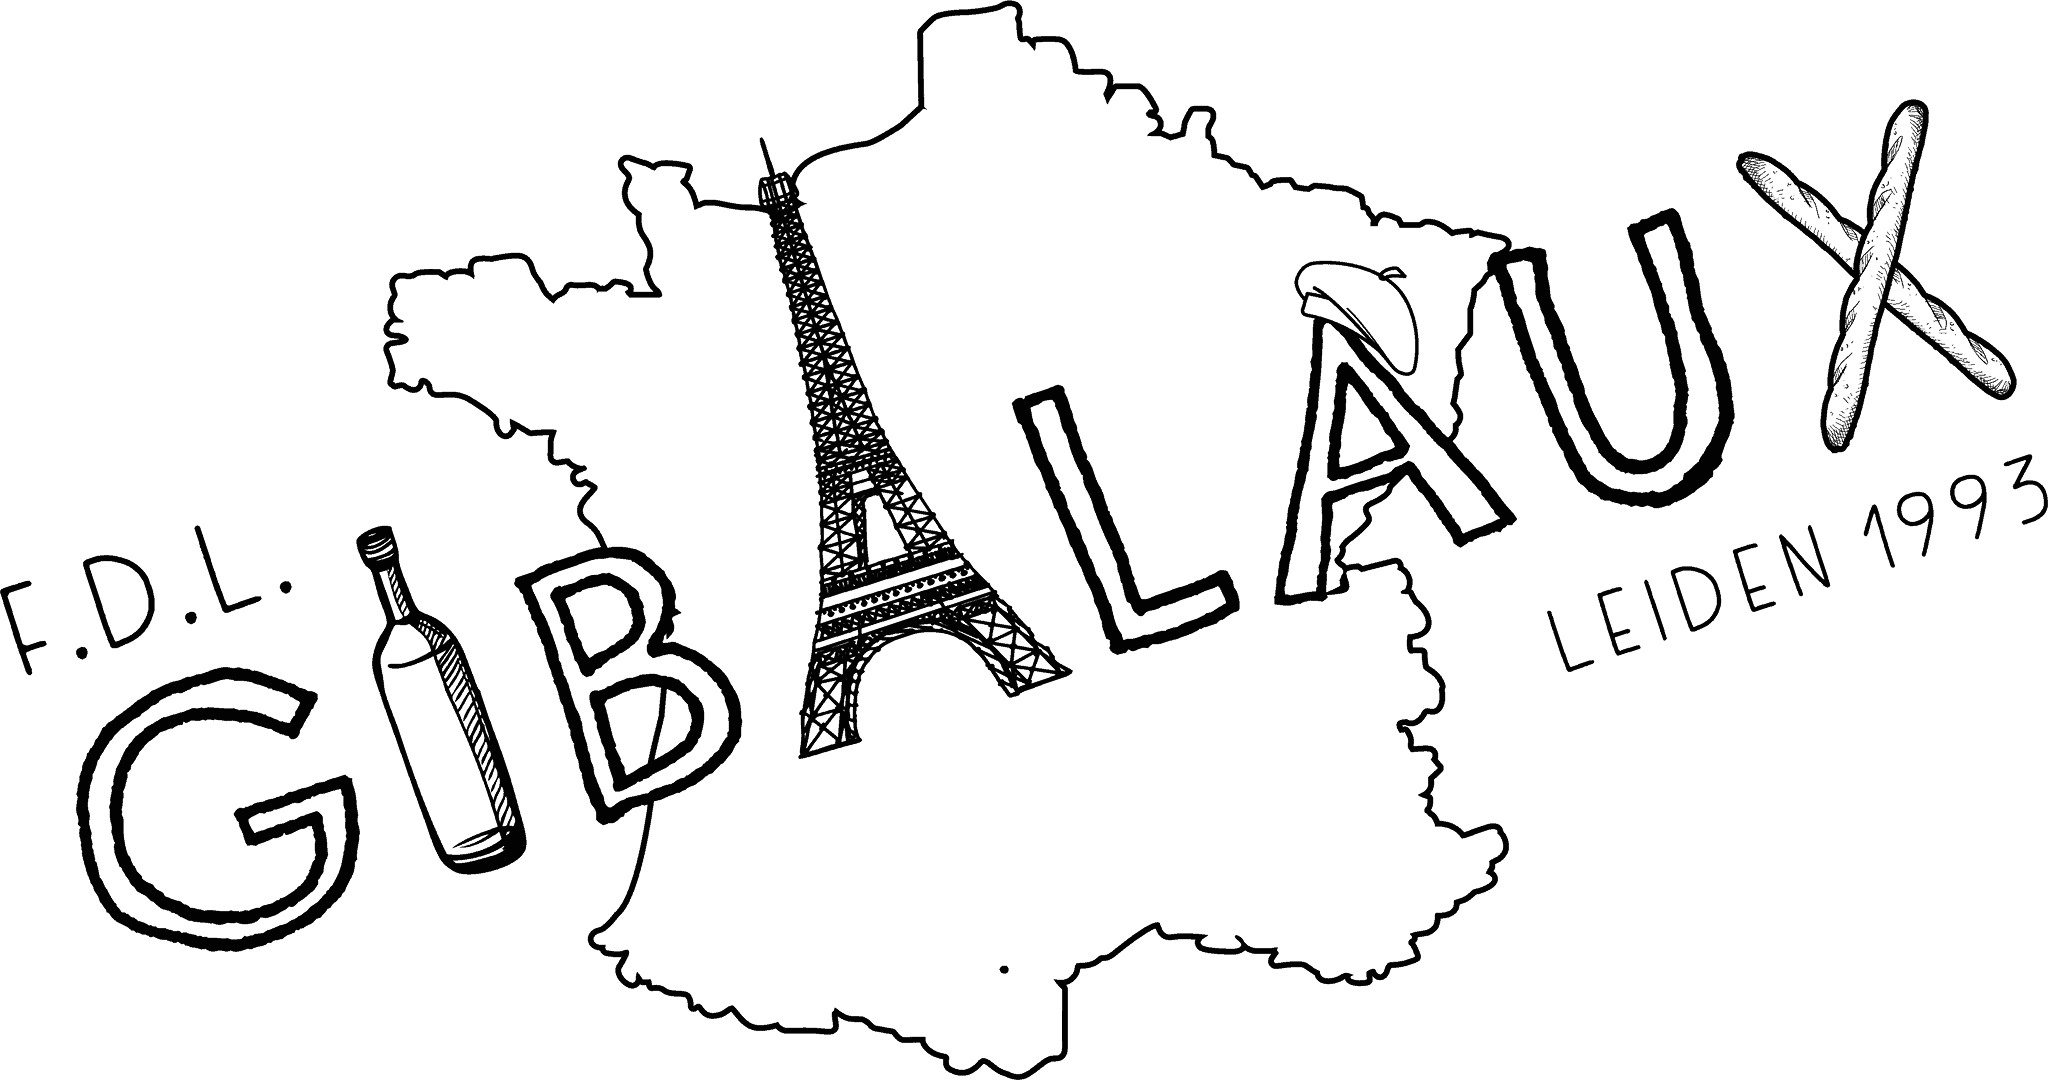 F.D.L. Gibalaux